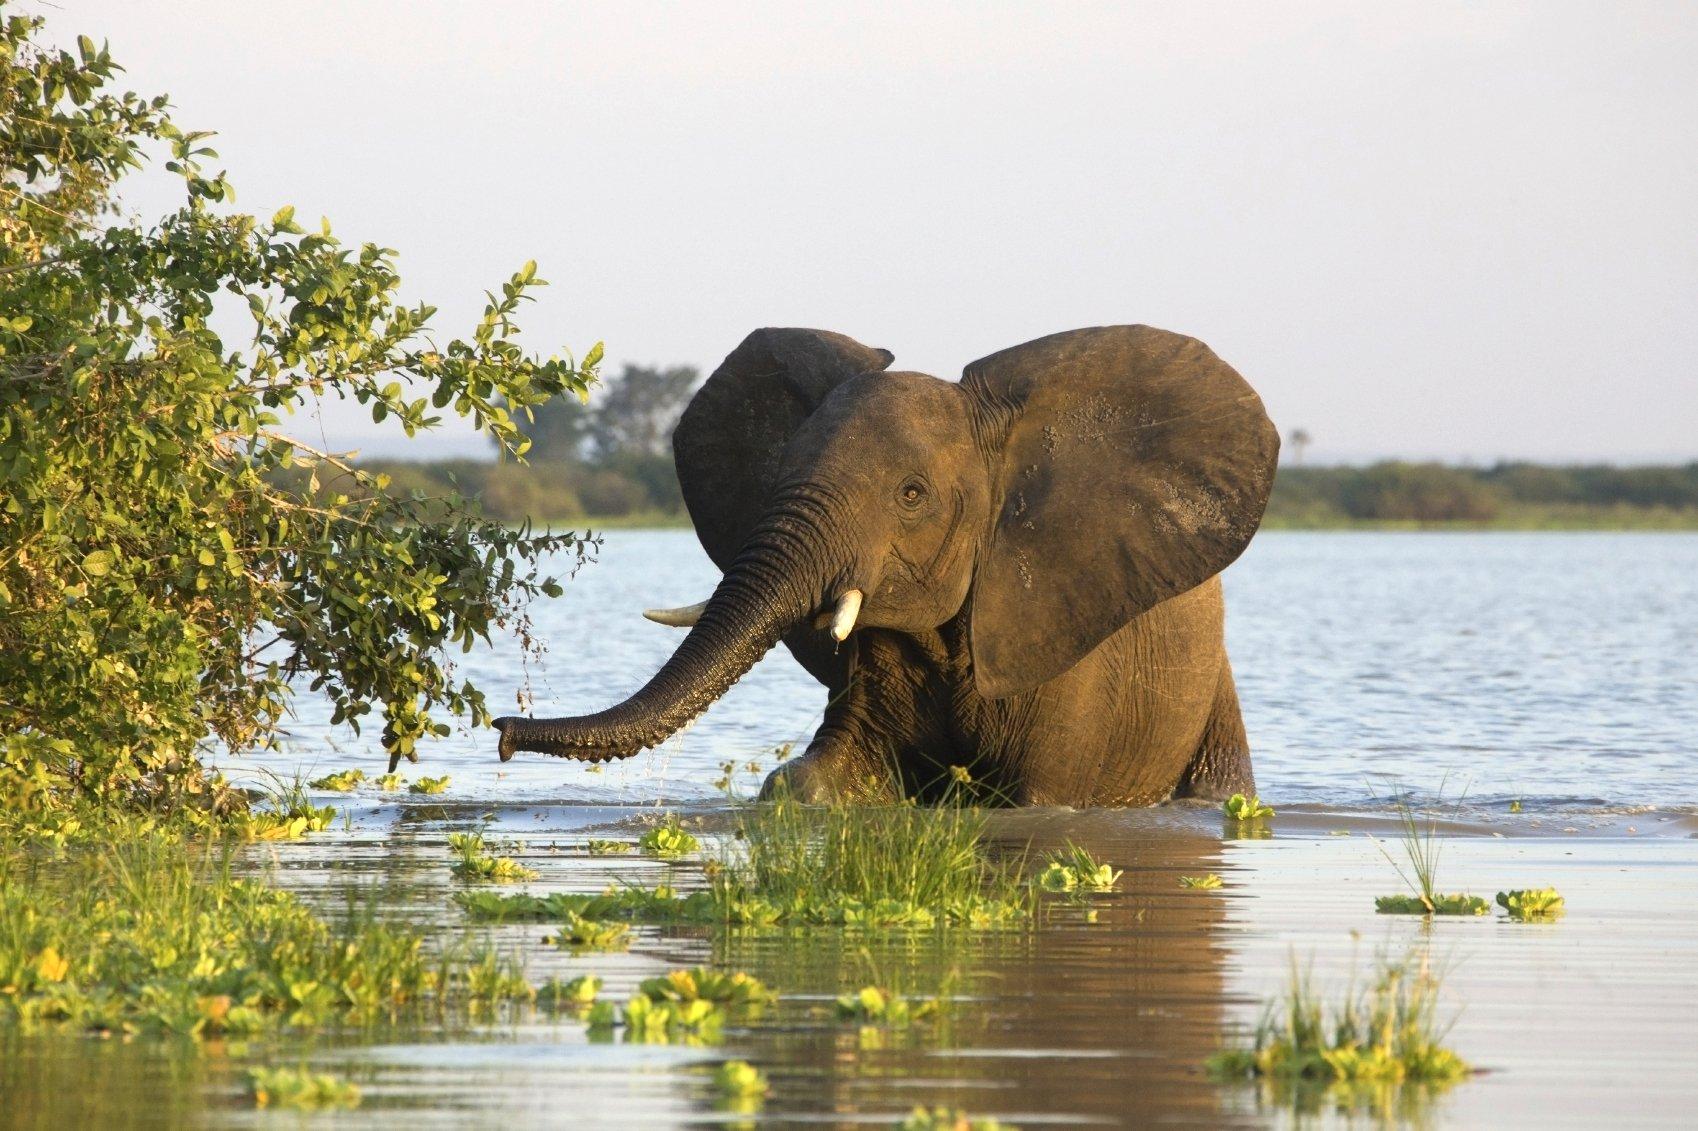 selous-game-reserve-elefant-iStock_000013402442Medium